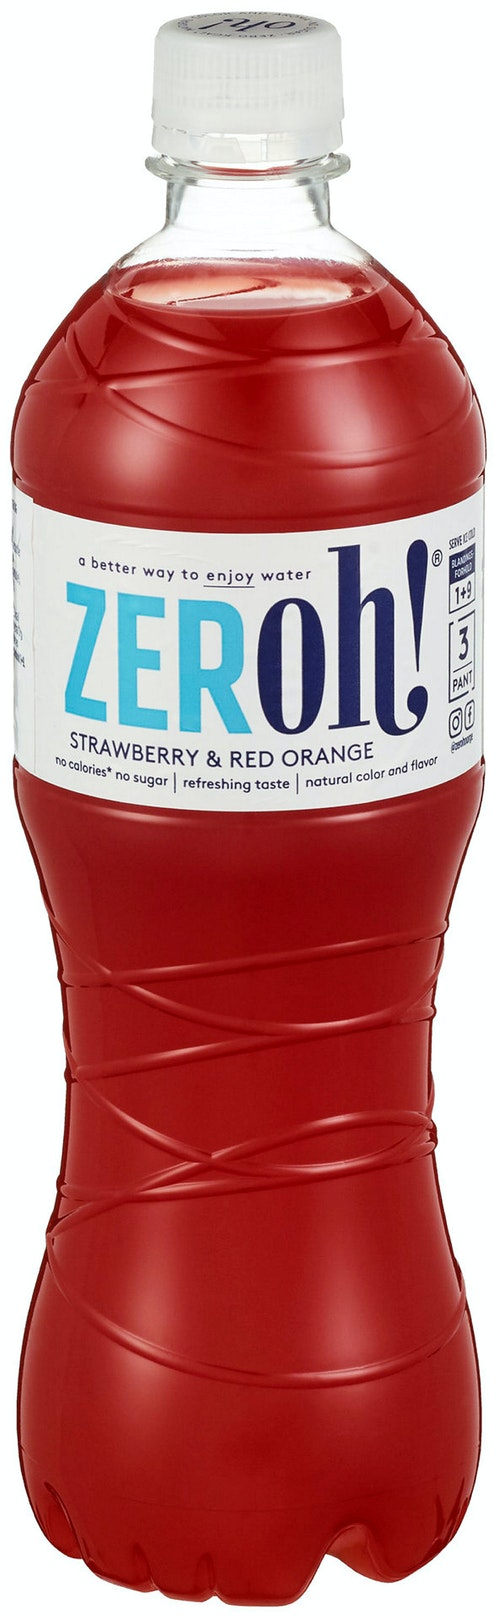 Zeroh! Strawberry & Red Orange 0,8 l